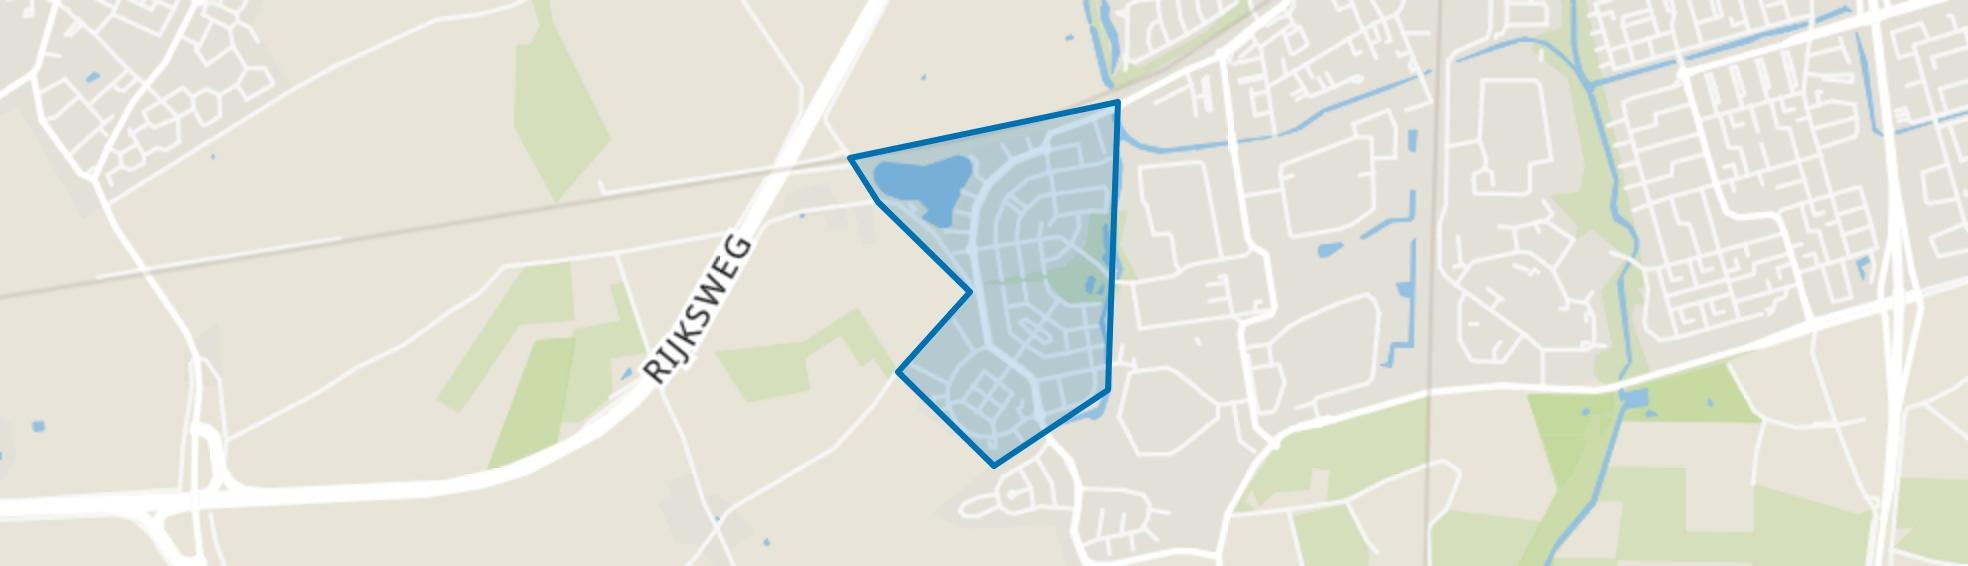 Tolberg-West, Roosendaal map